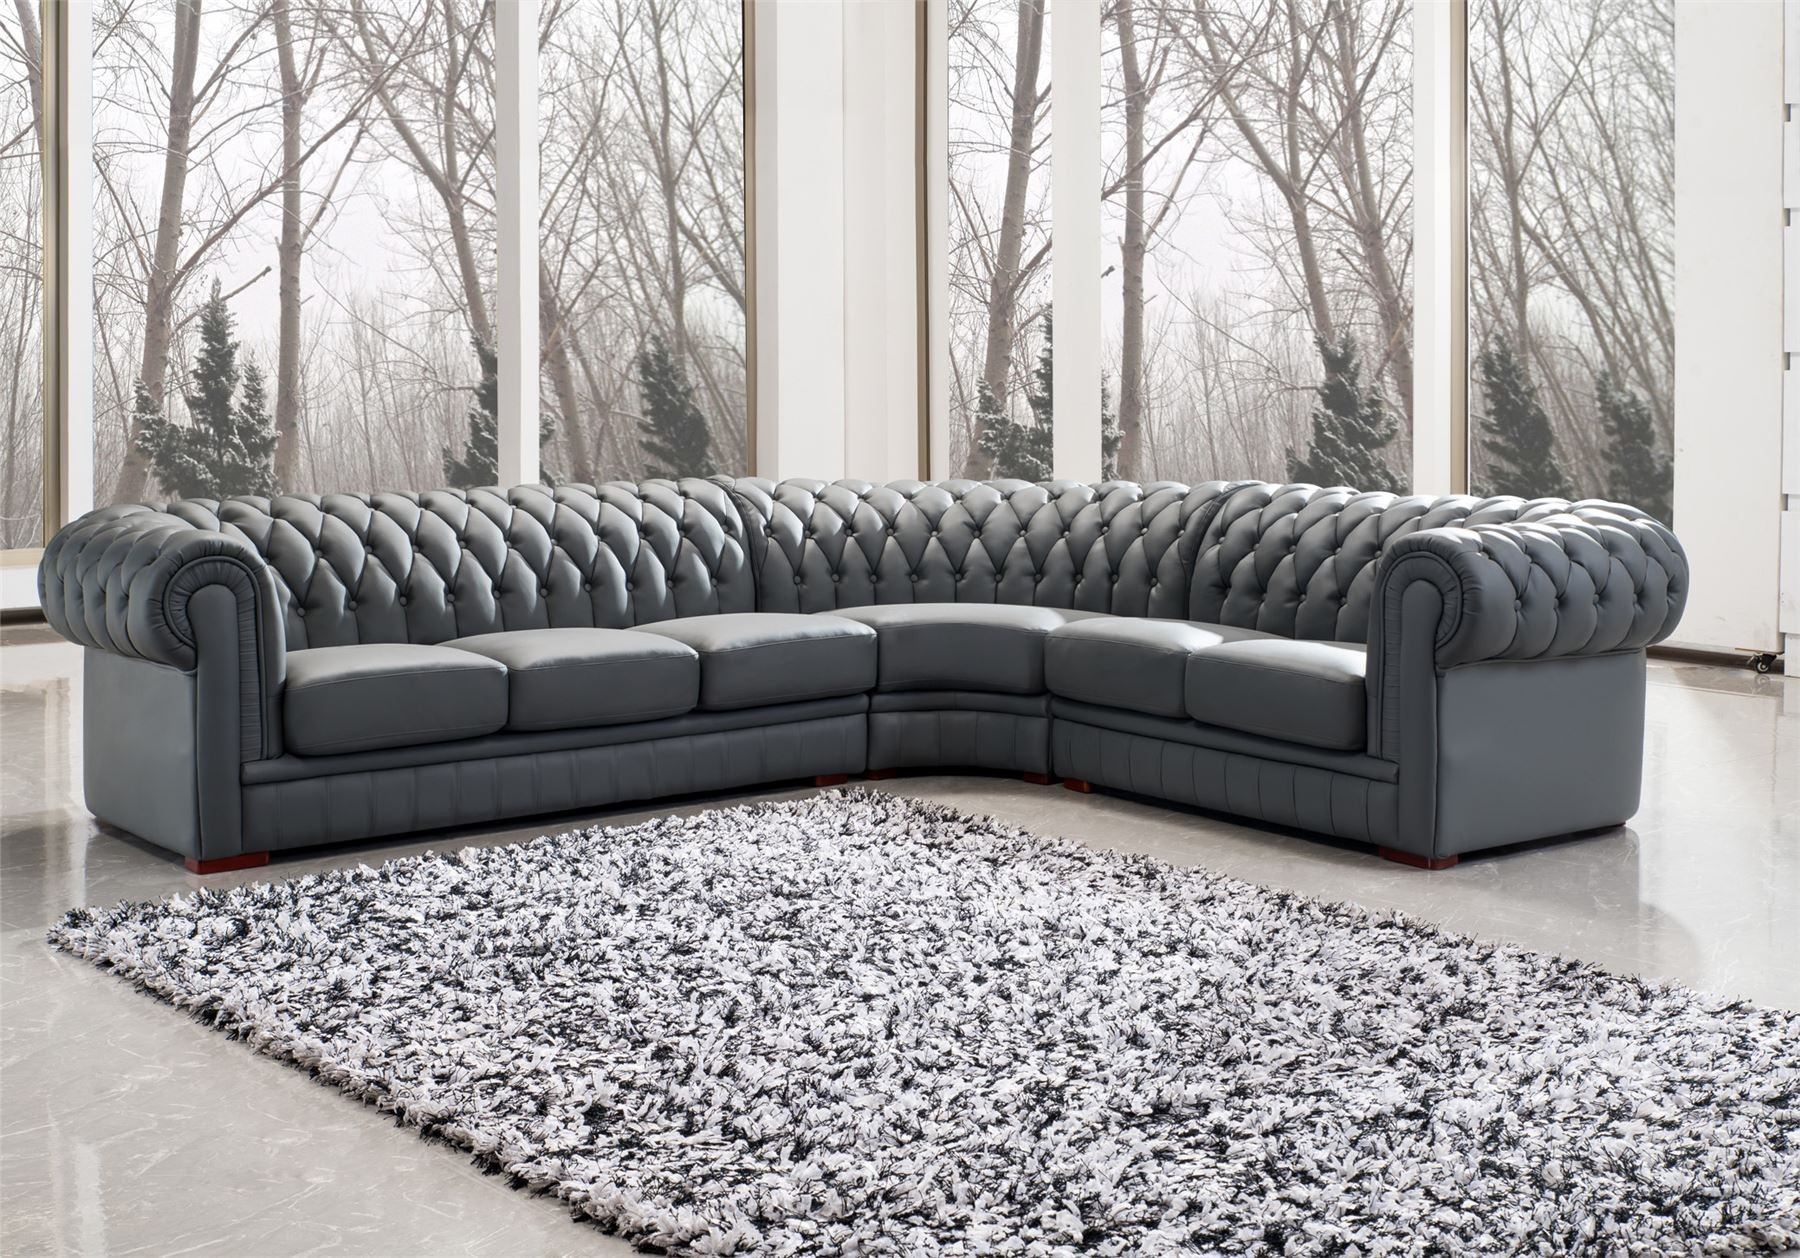 best family sofas uk daybed as sofa bespoke large corner ideas